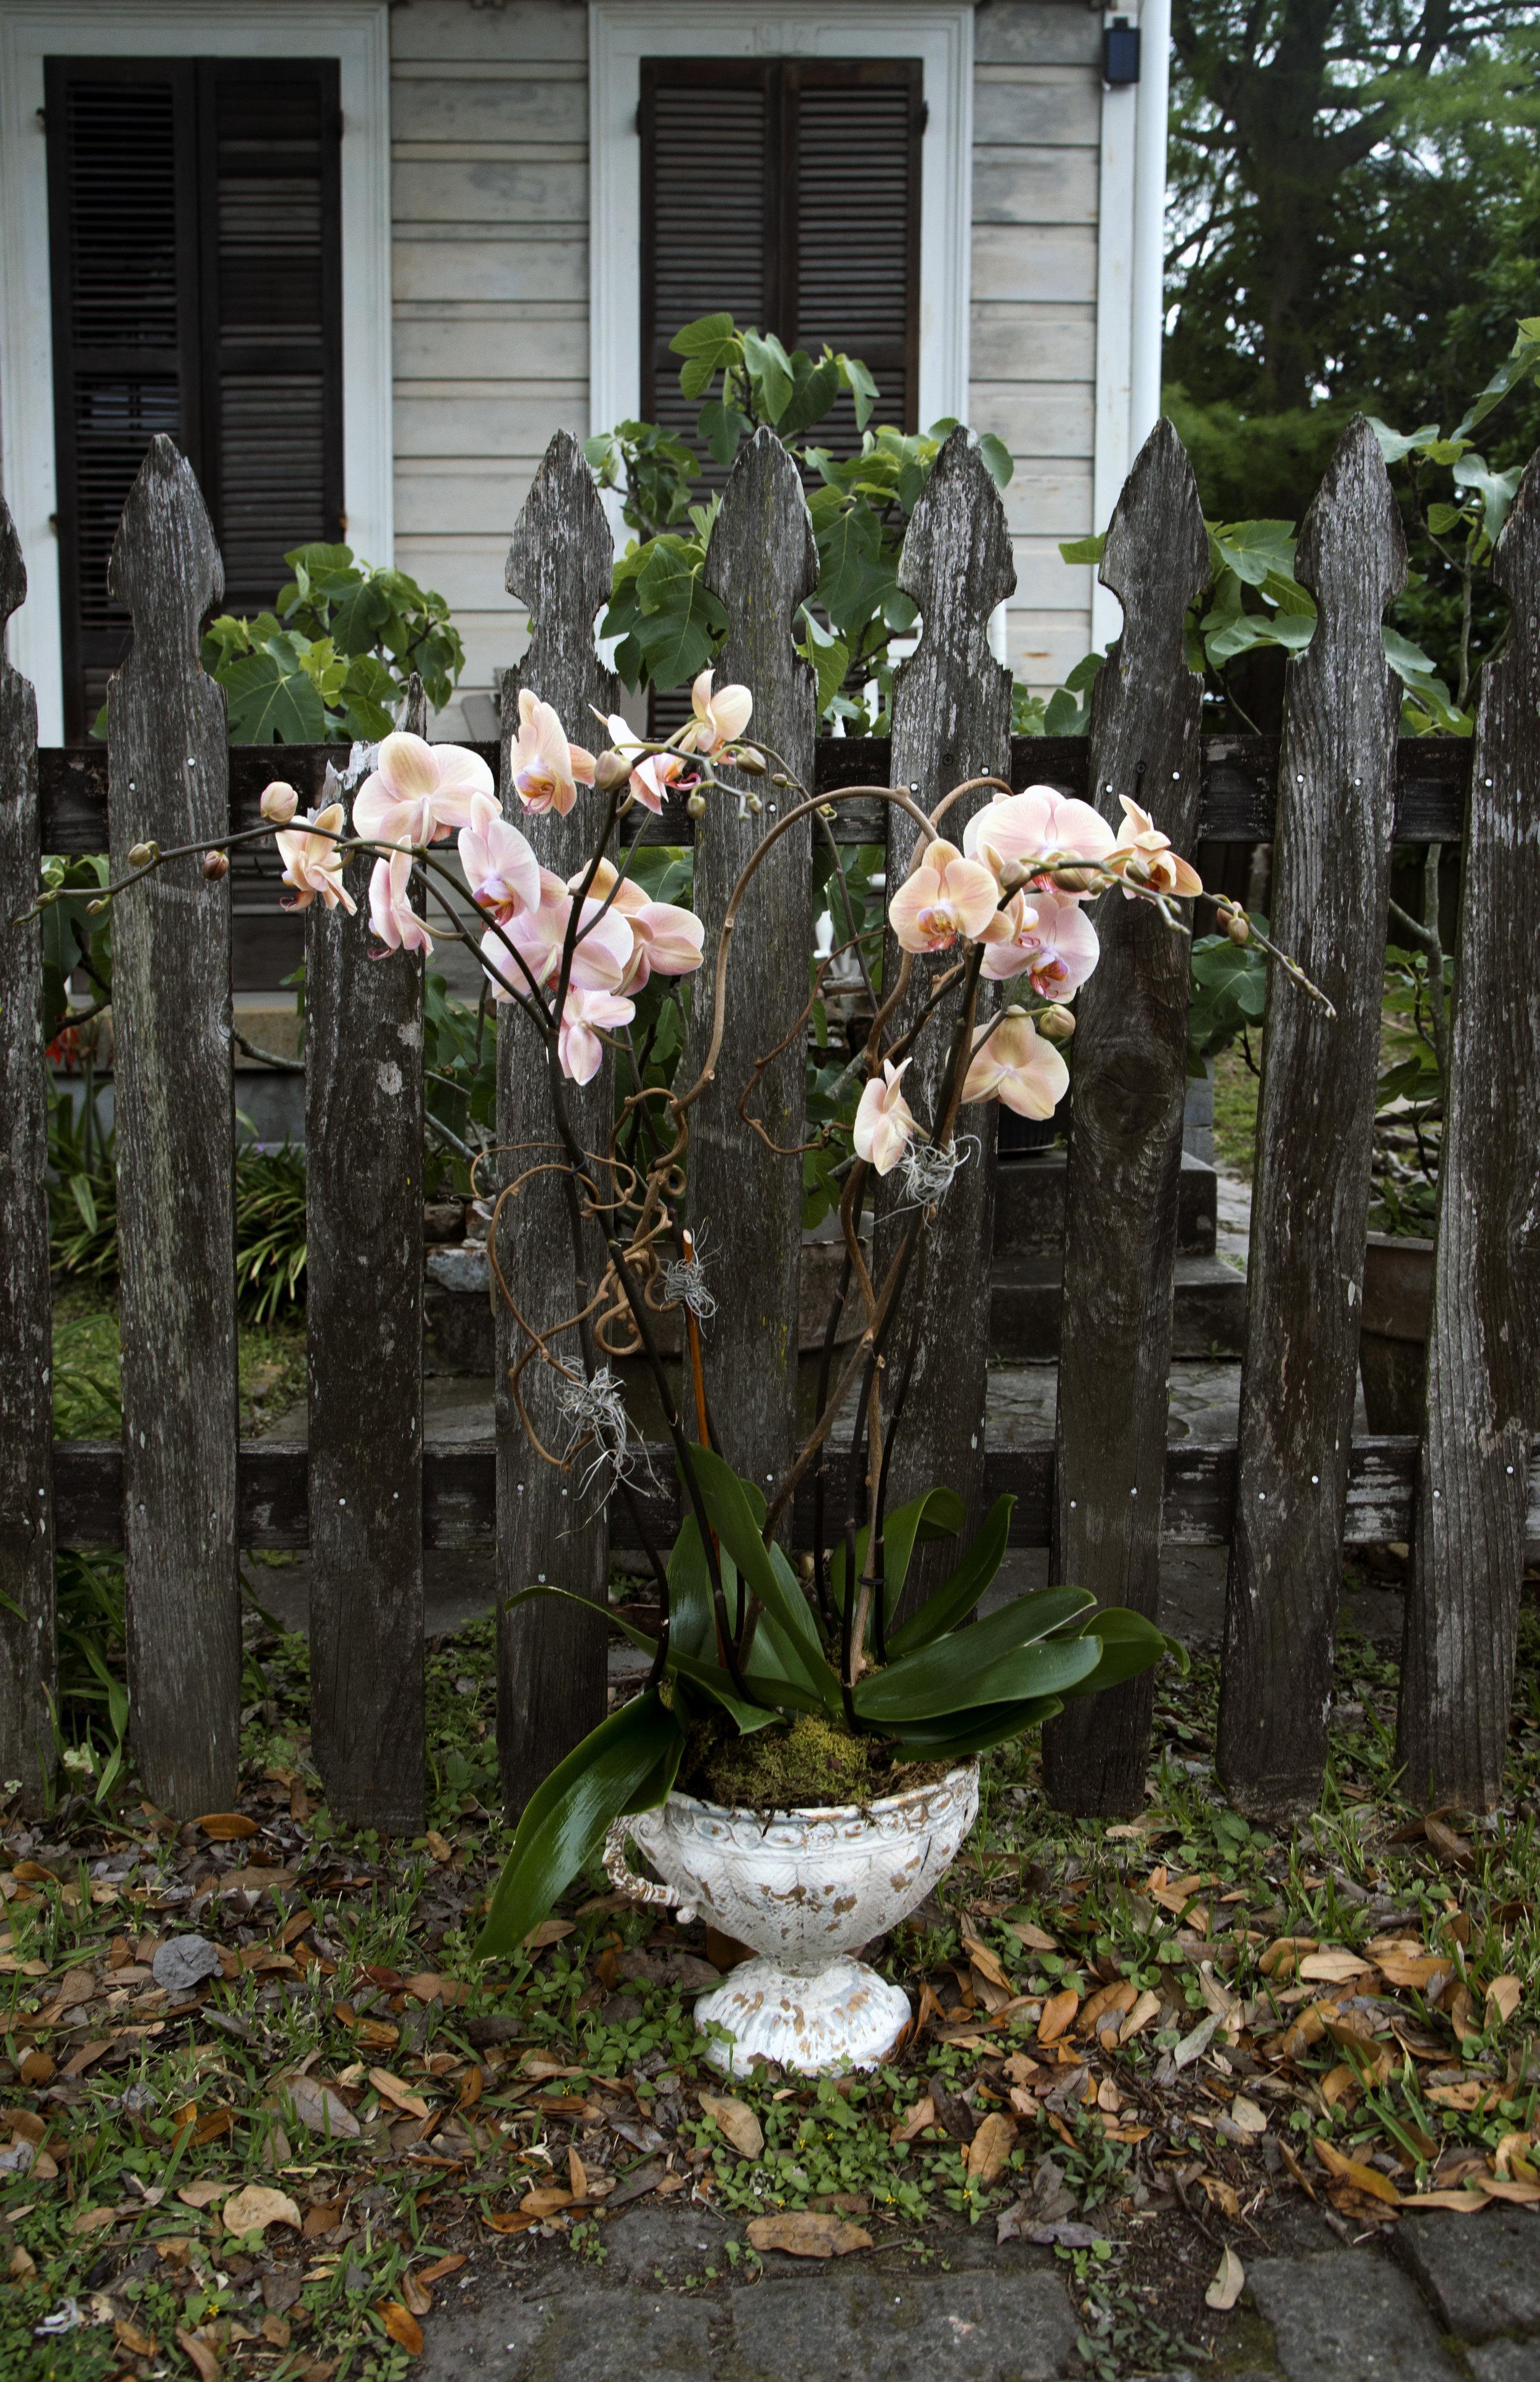 phalaenopsis orchids 6%22 peach mitchs flowers send an orchid plant near me flower shop stpehanie tarrant.jpg